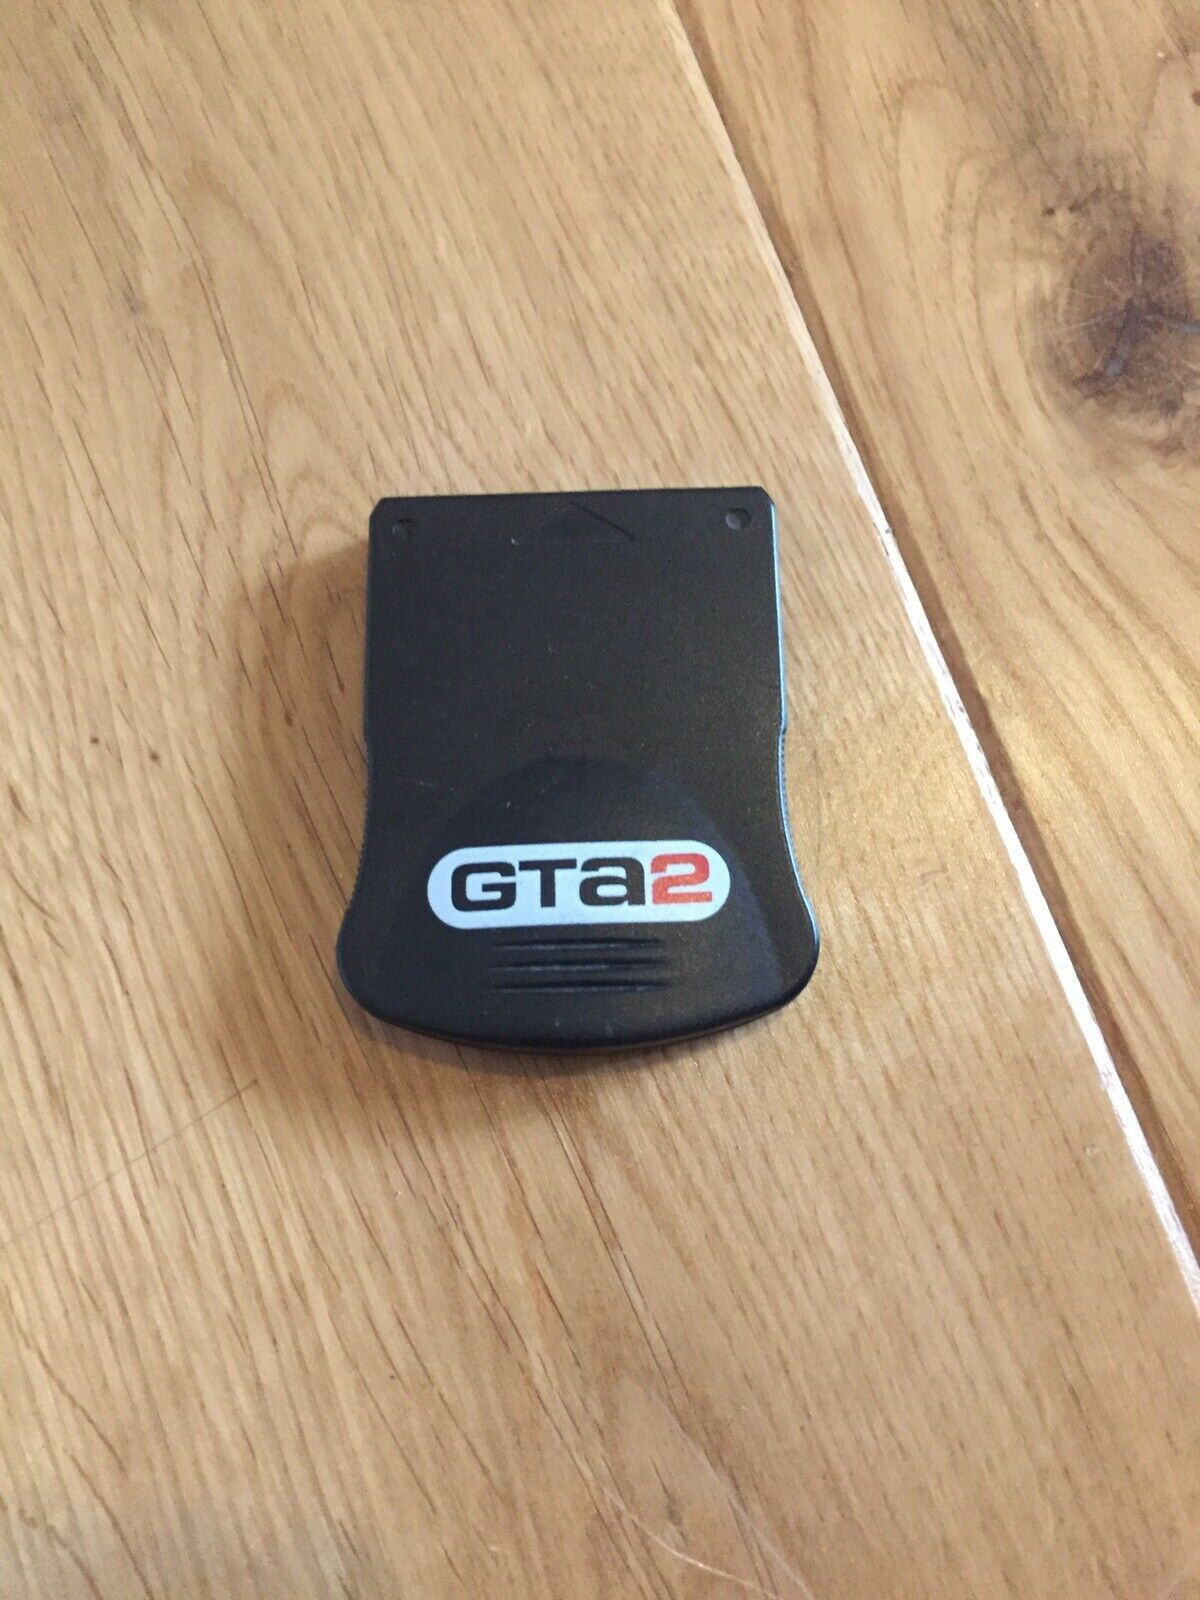 Grand Theft Auto GTA 2 - 1MB Playstation 1 PS1 Memory Card / Retro Gaming